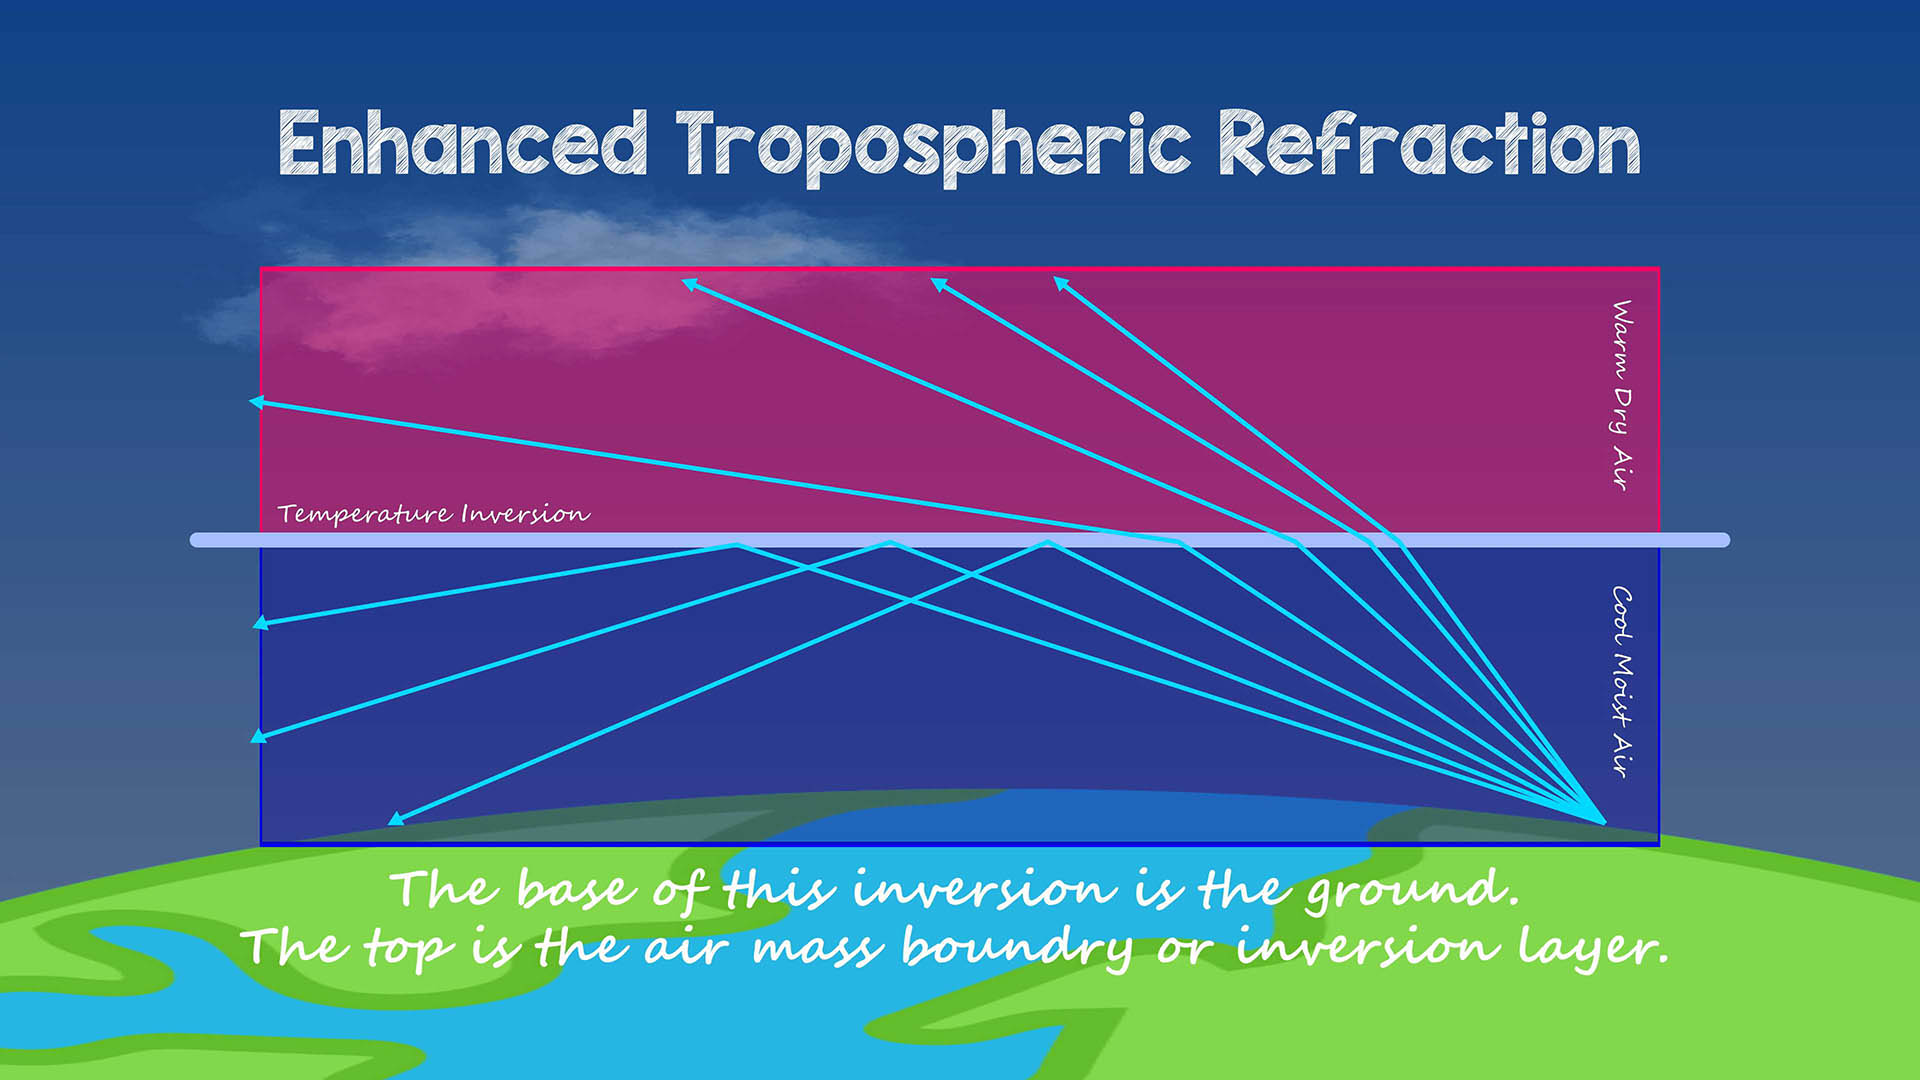 Enhanced Tropospheric Refraction